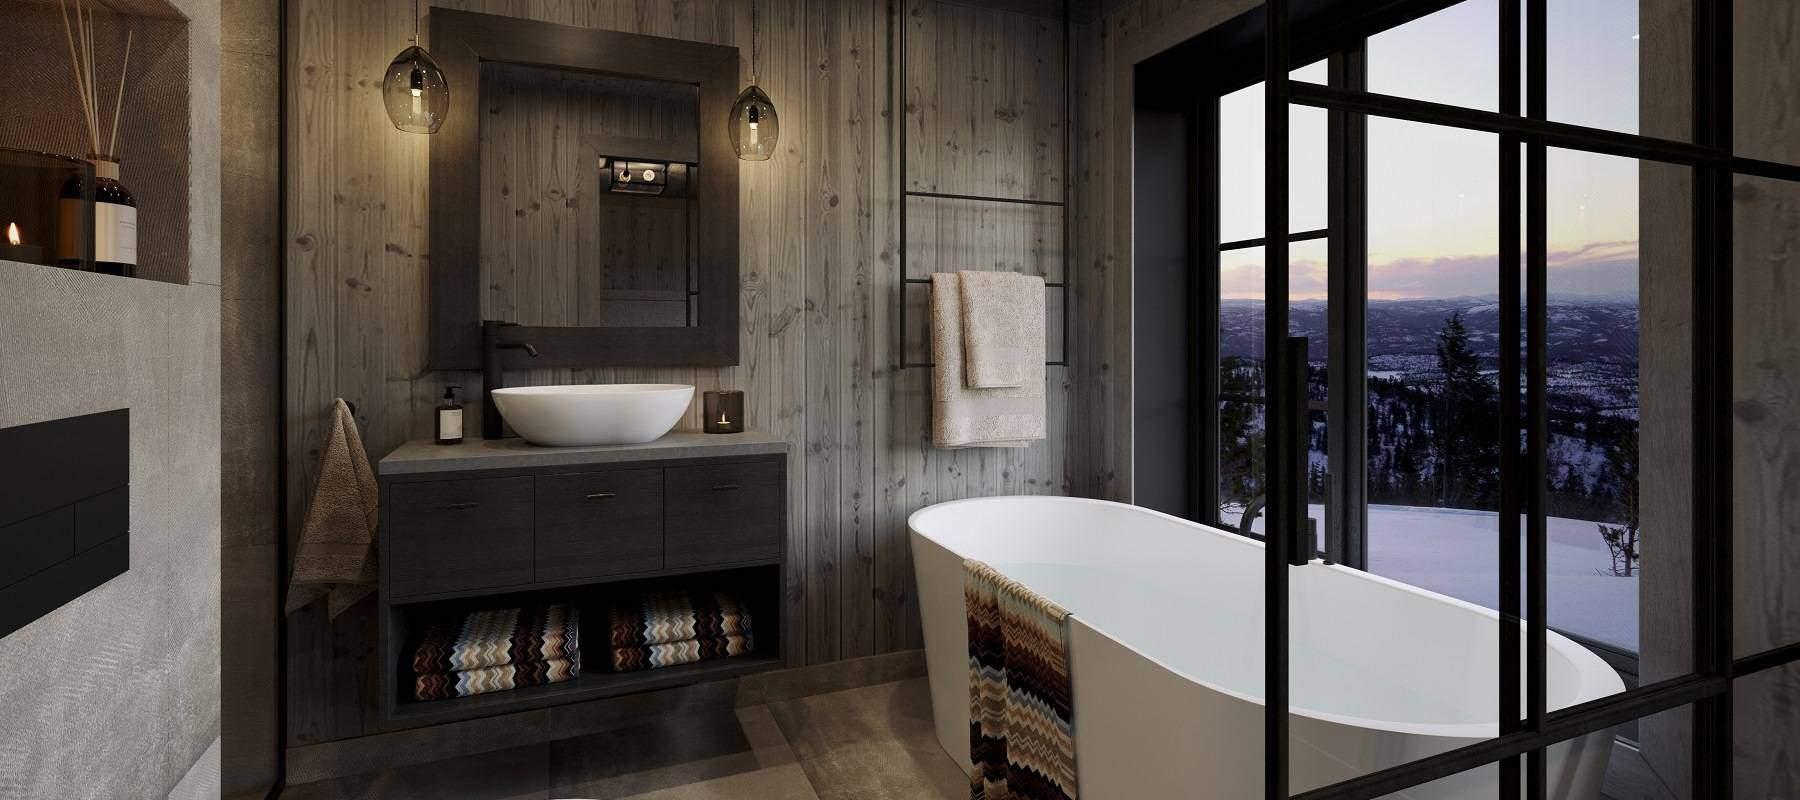 42 Hytte Geilo 155 . Masterbad med badekar og dusjnisje.